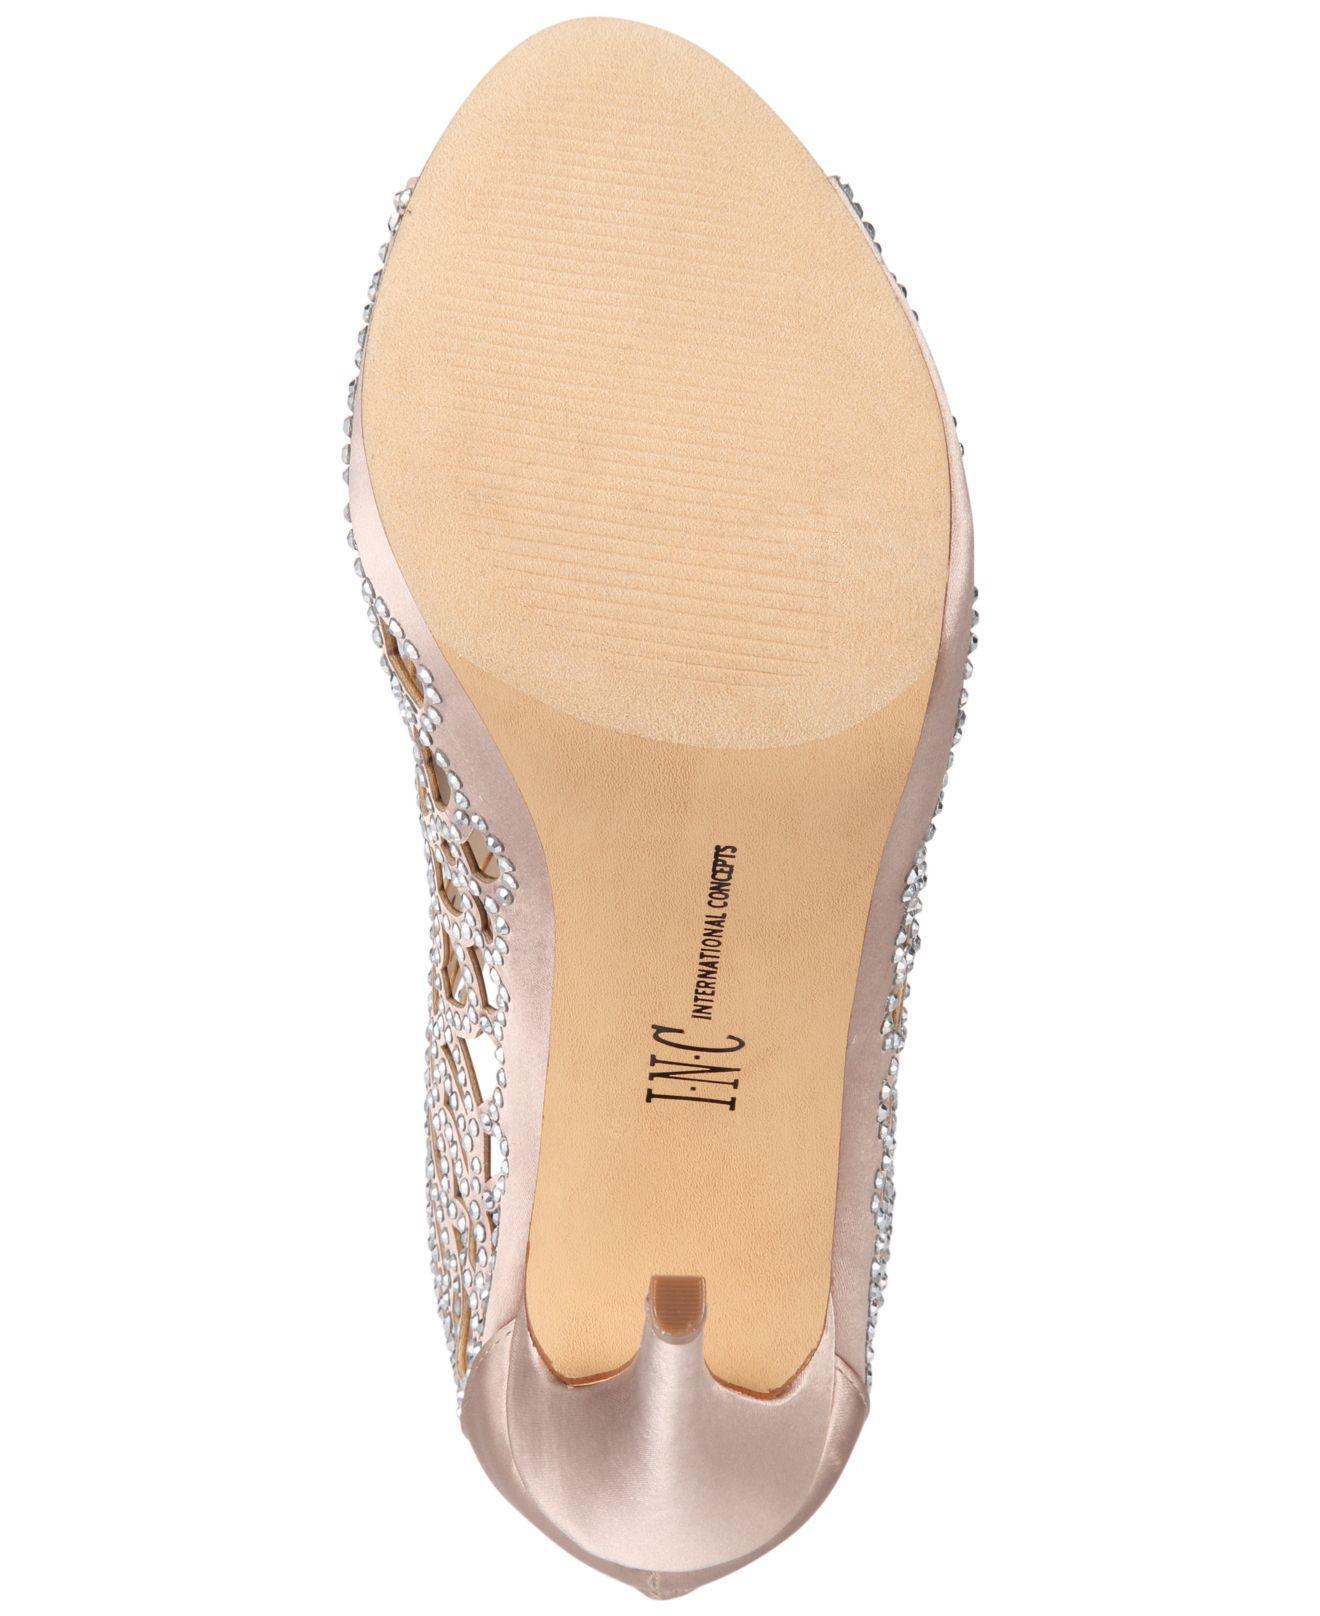 7e2c15bd6ea4a Lyst - INC International Concepts Sarane Evening Sandals in Natural